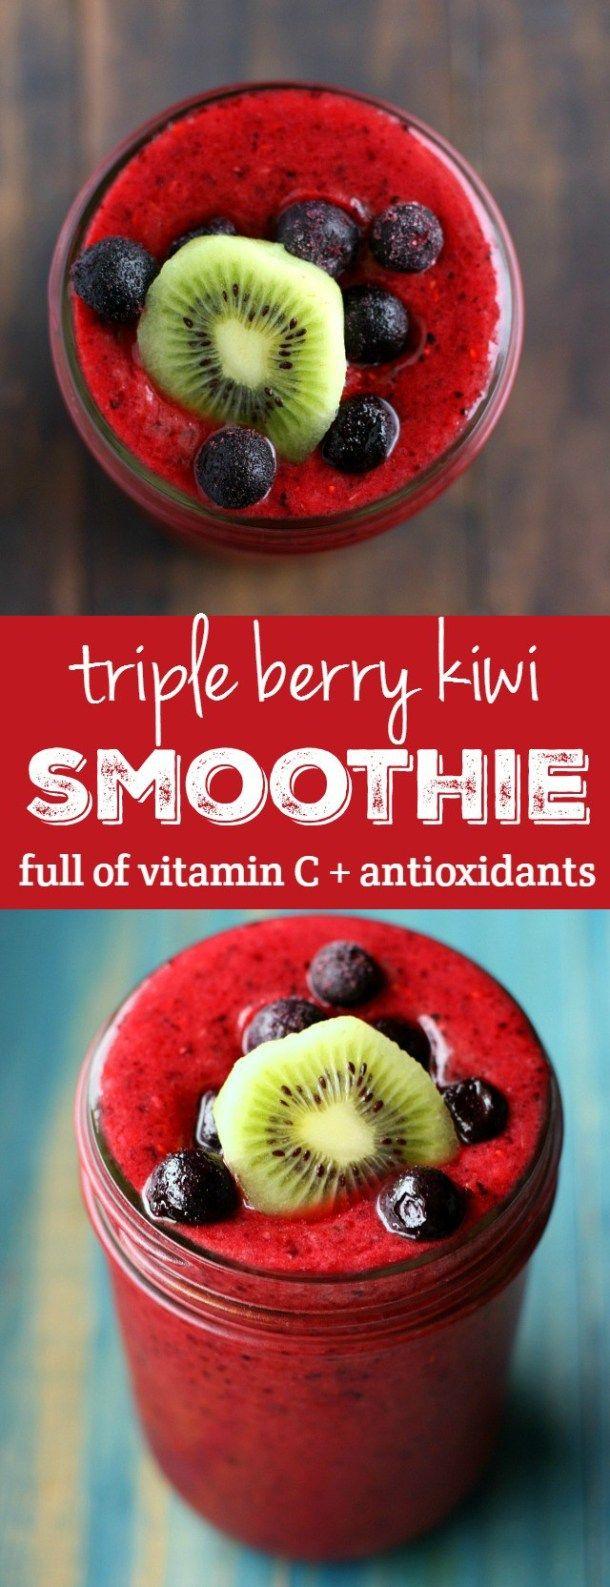 Immunity Boosting Triple Berry Kiwi Smoothie Recipe via The Pretty Bee - Full of Vitamin C and Antioxidants - Healthy Snacks and Treats Recipes